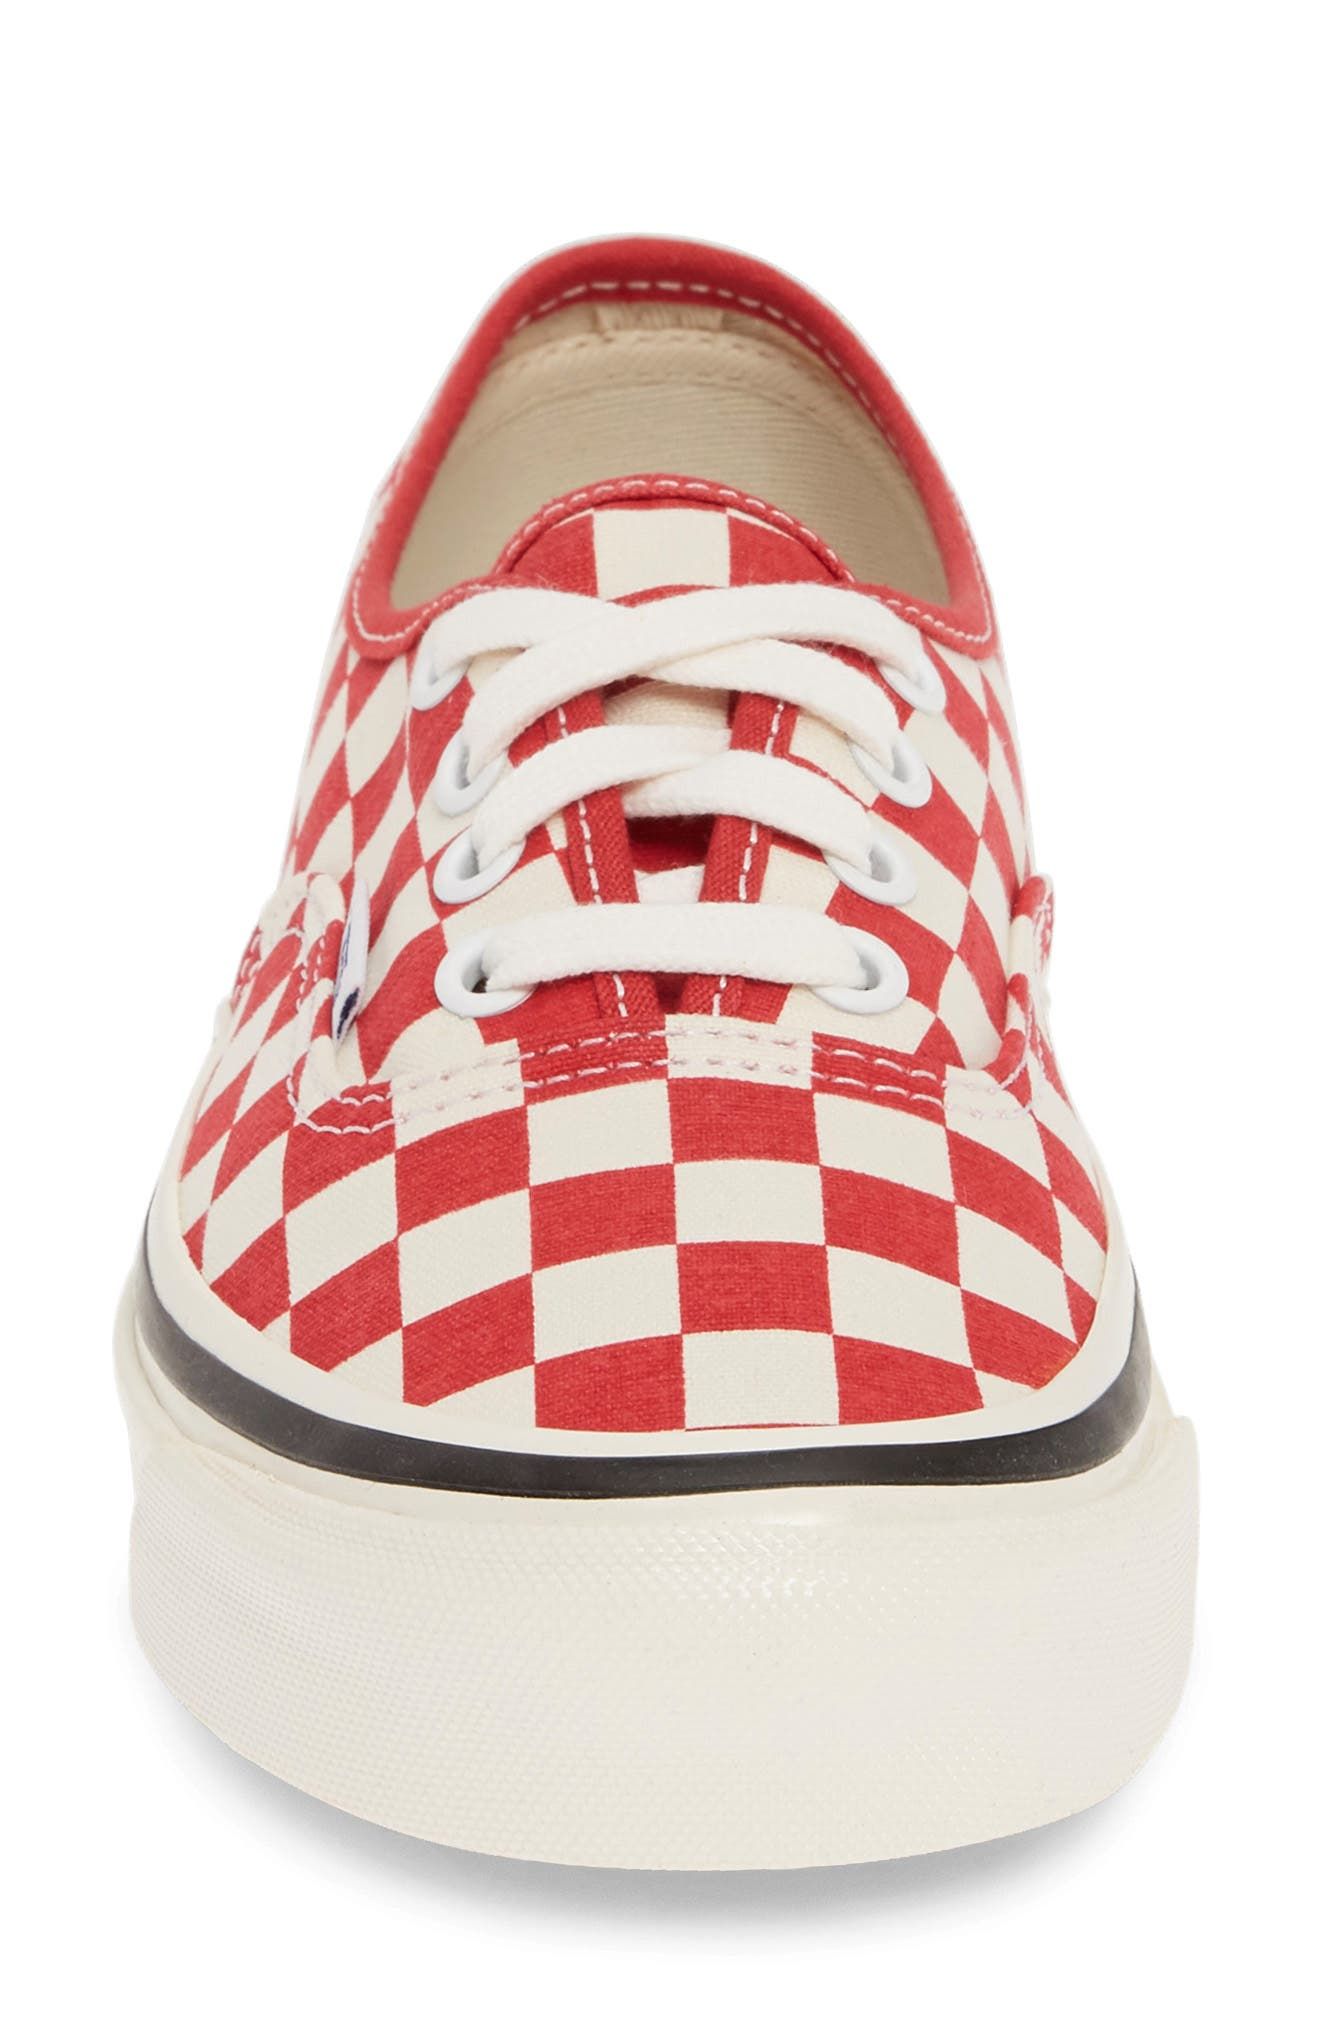 VANS, Authentic 44 DX Sneaker, Alternate thumbnail 4, color, RED/ CHECK